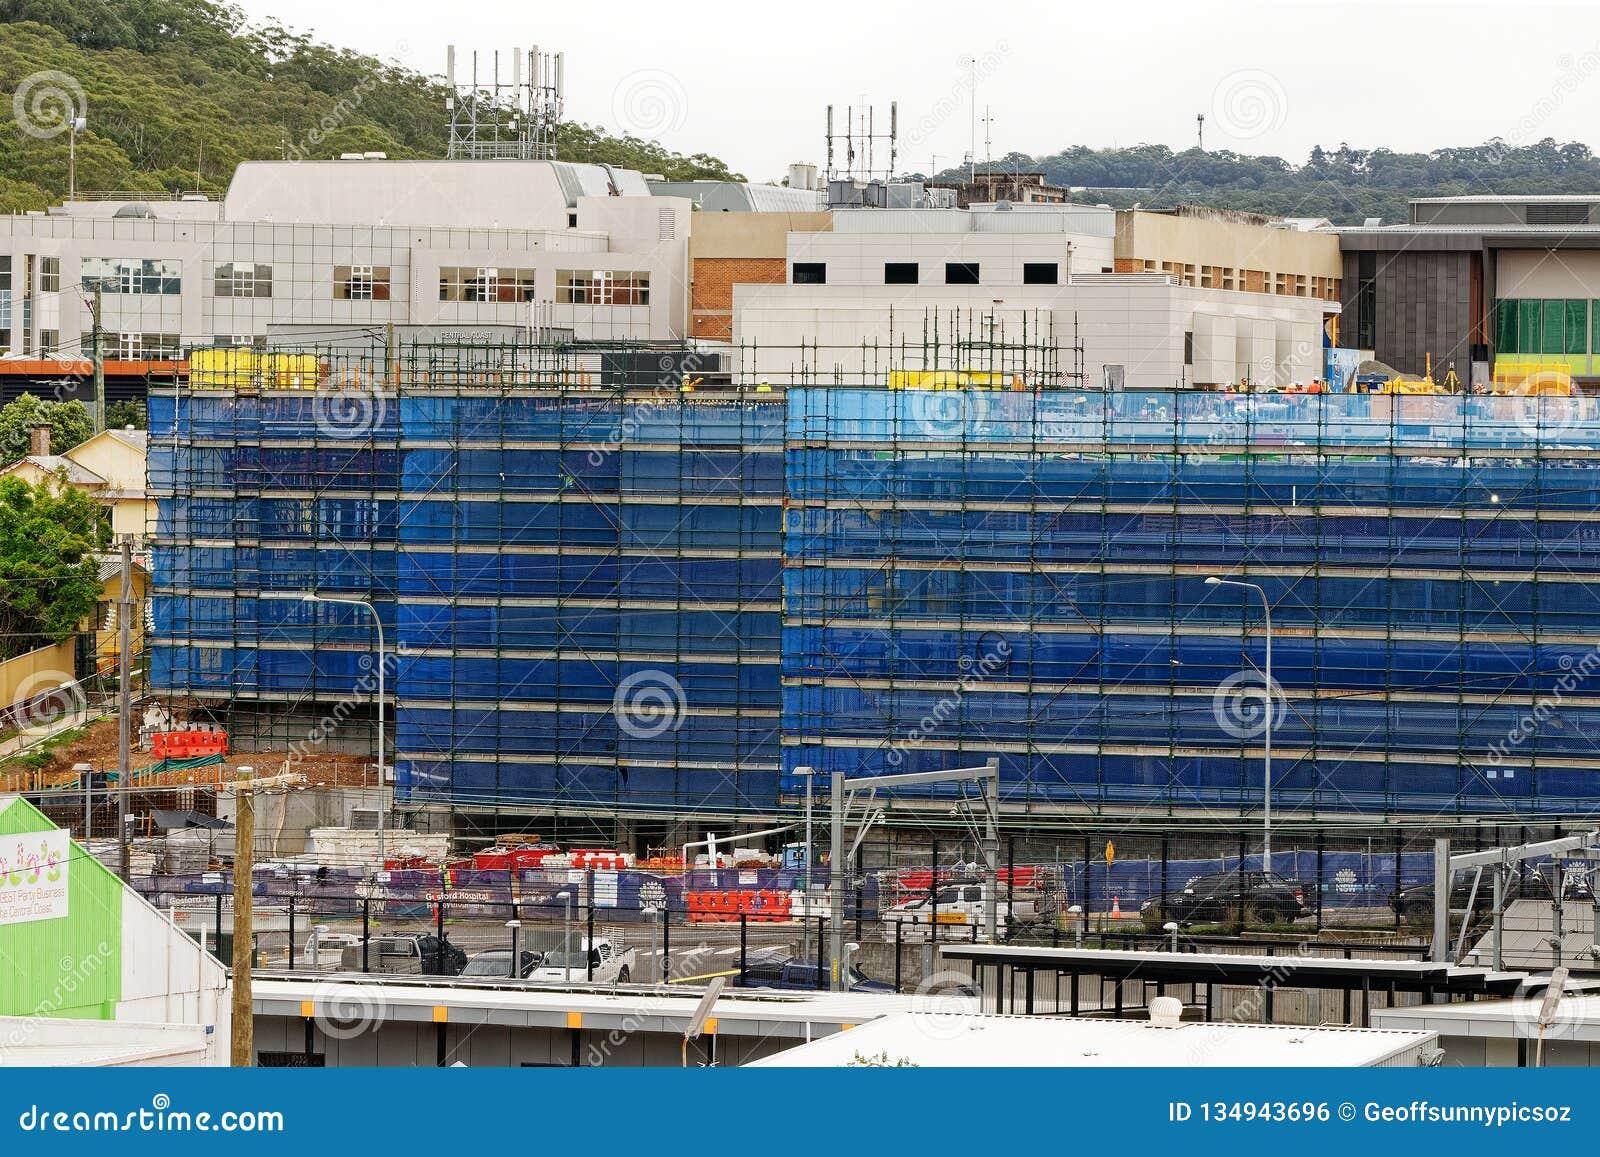 Gosford hospital edificio progreso H47ed octubre de 2018